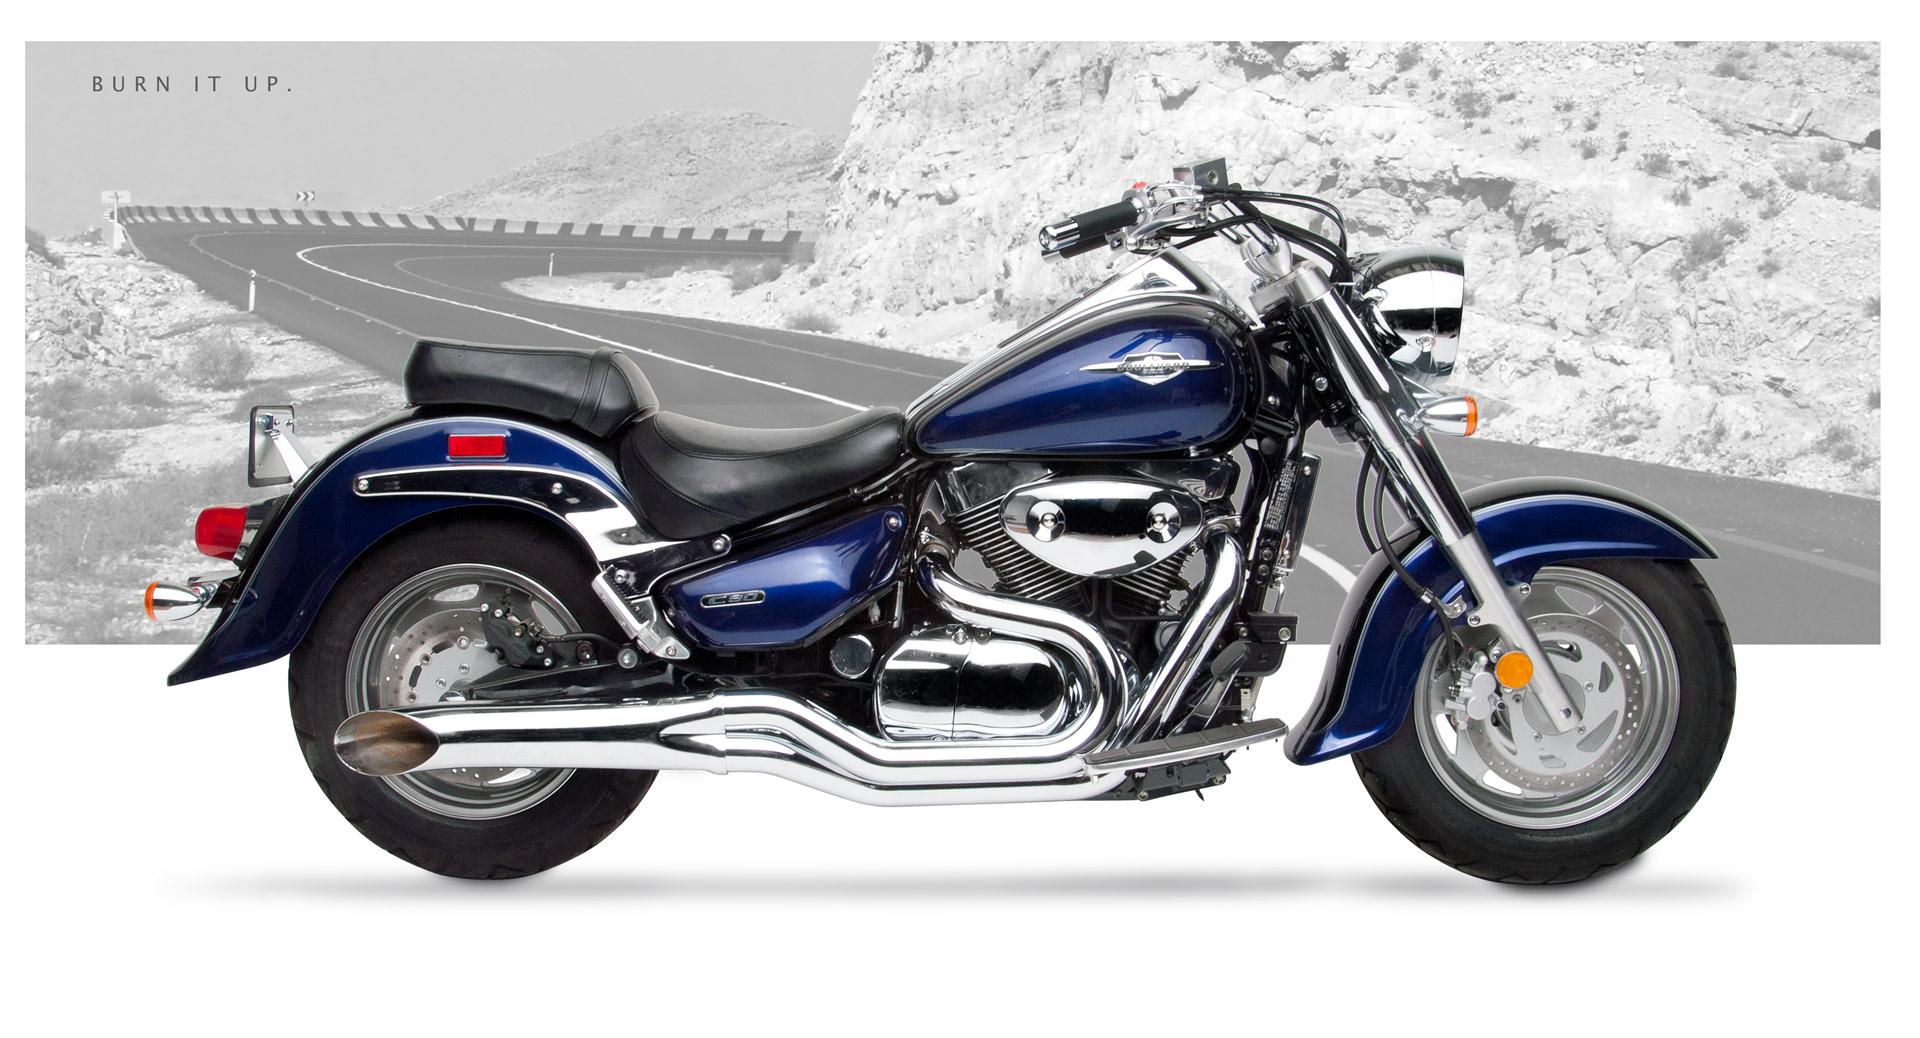 Suzuki C90 Motorcycle Exhaust - Sideburner Chrome | Hard-Krome